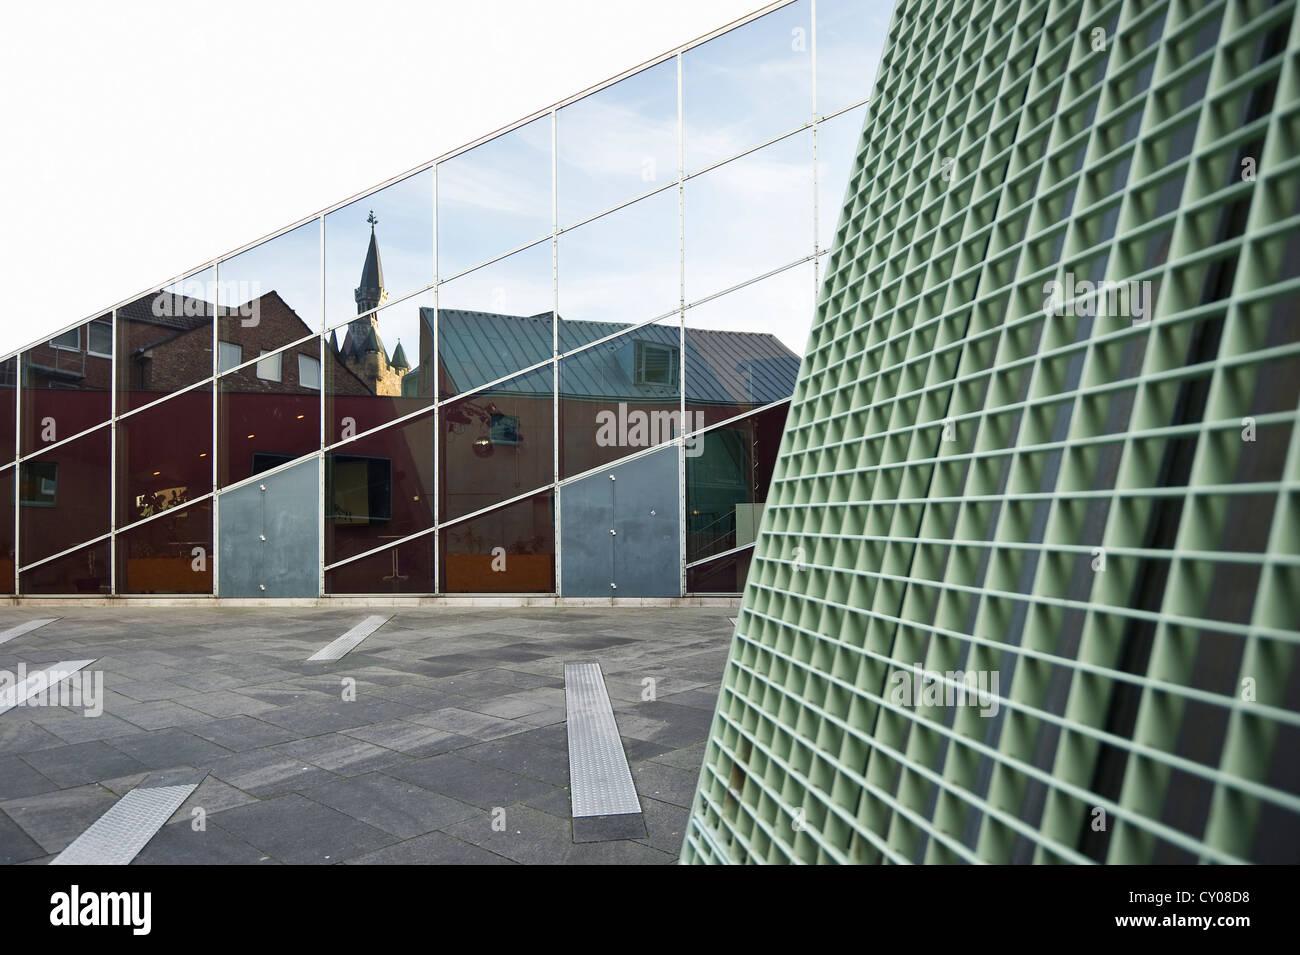 Aachen Fenster building, Aachen, North Rhine-Westphalia - Stock Image